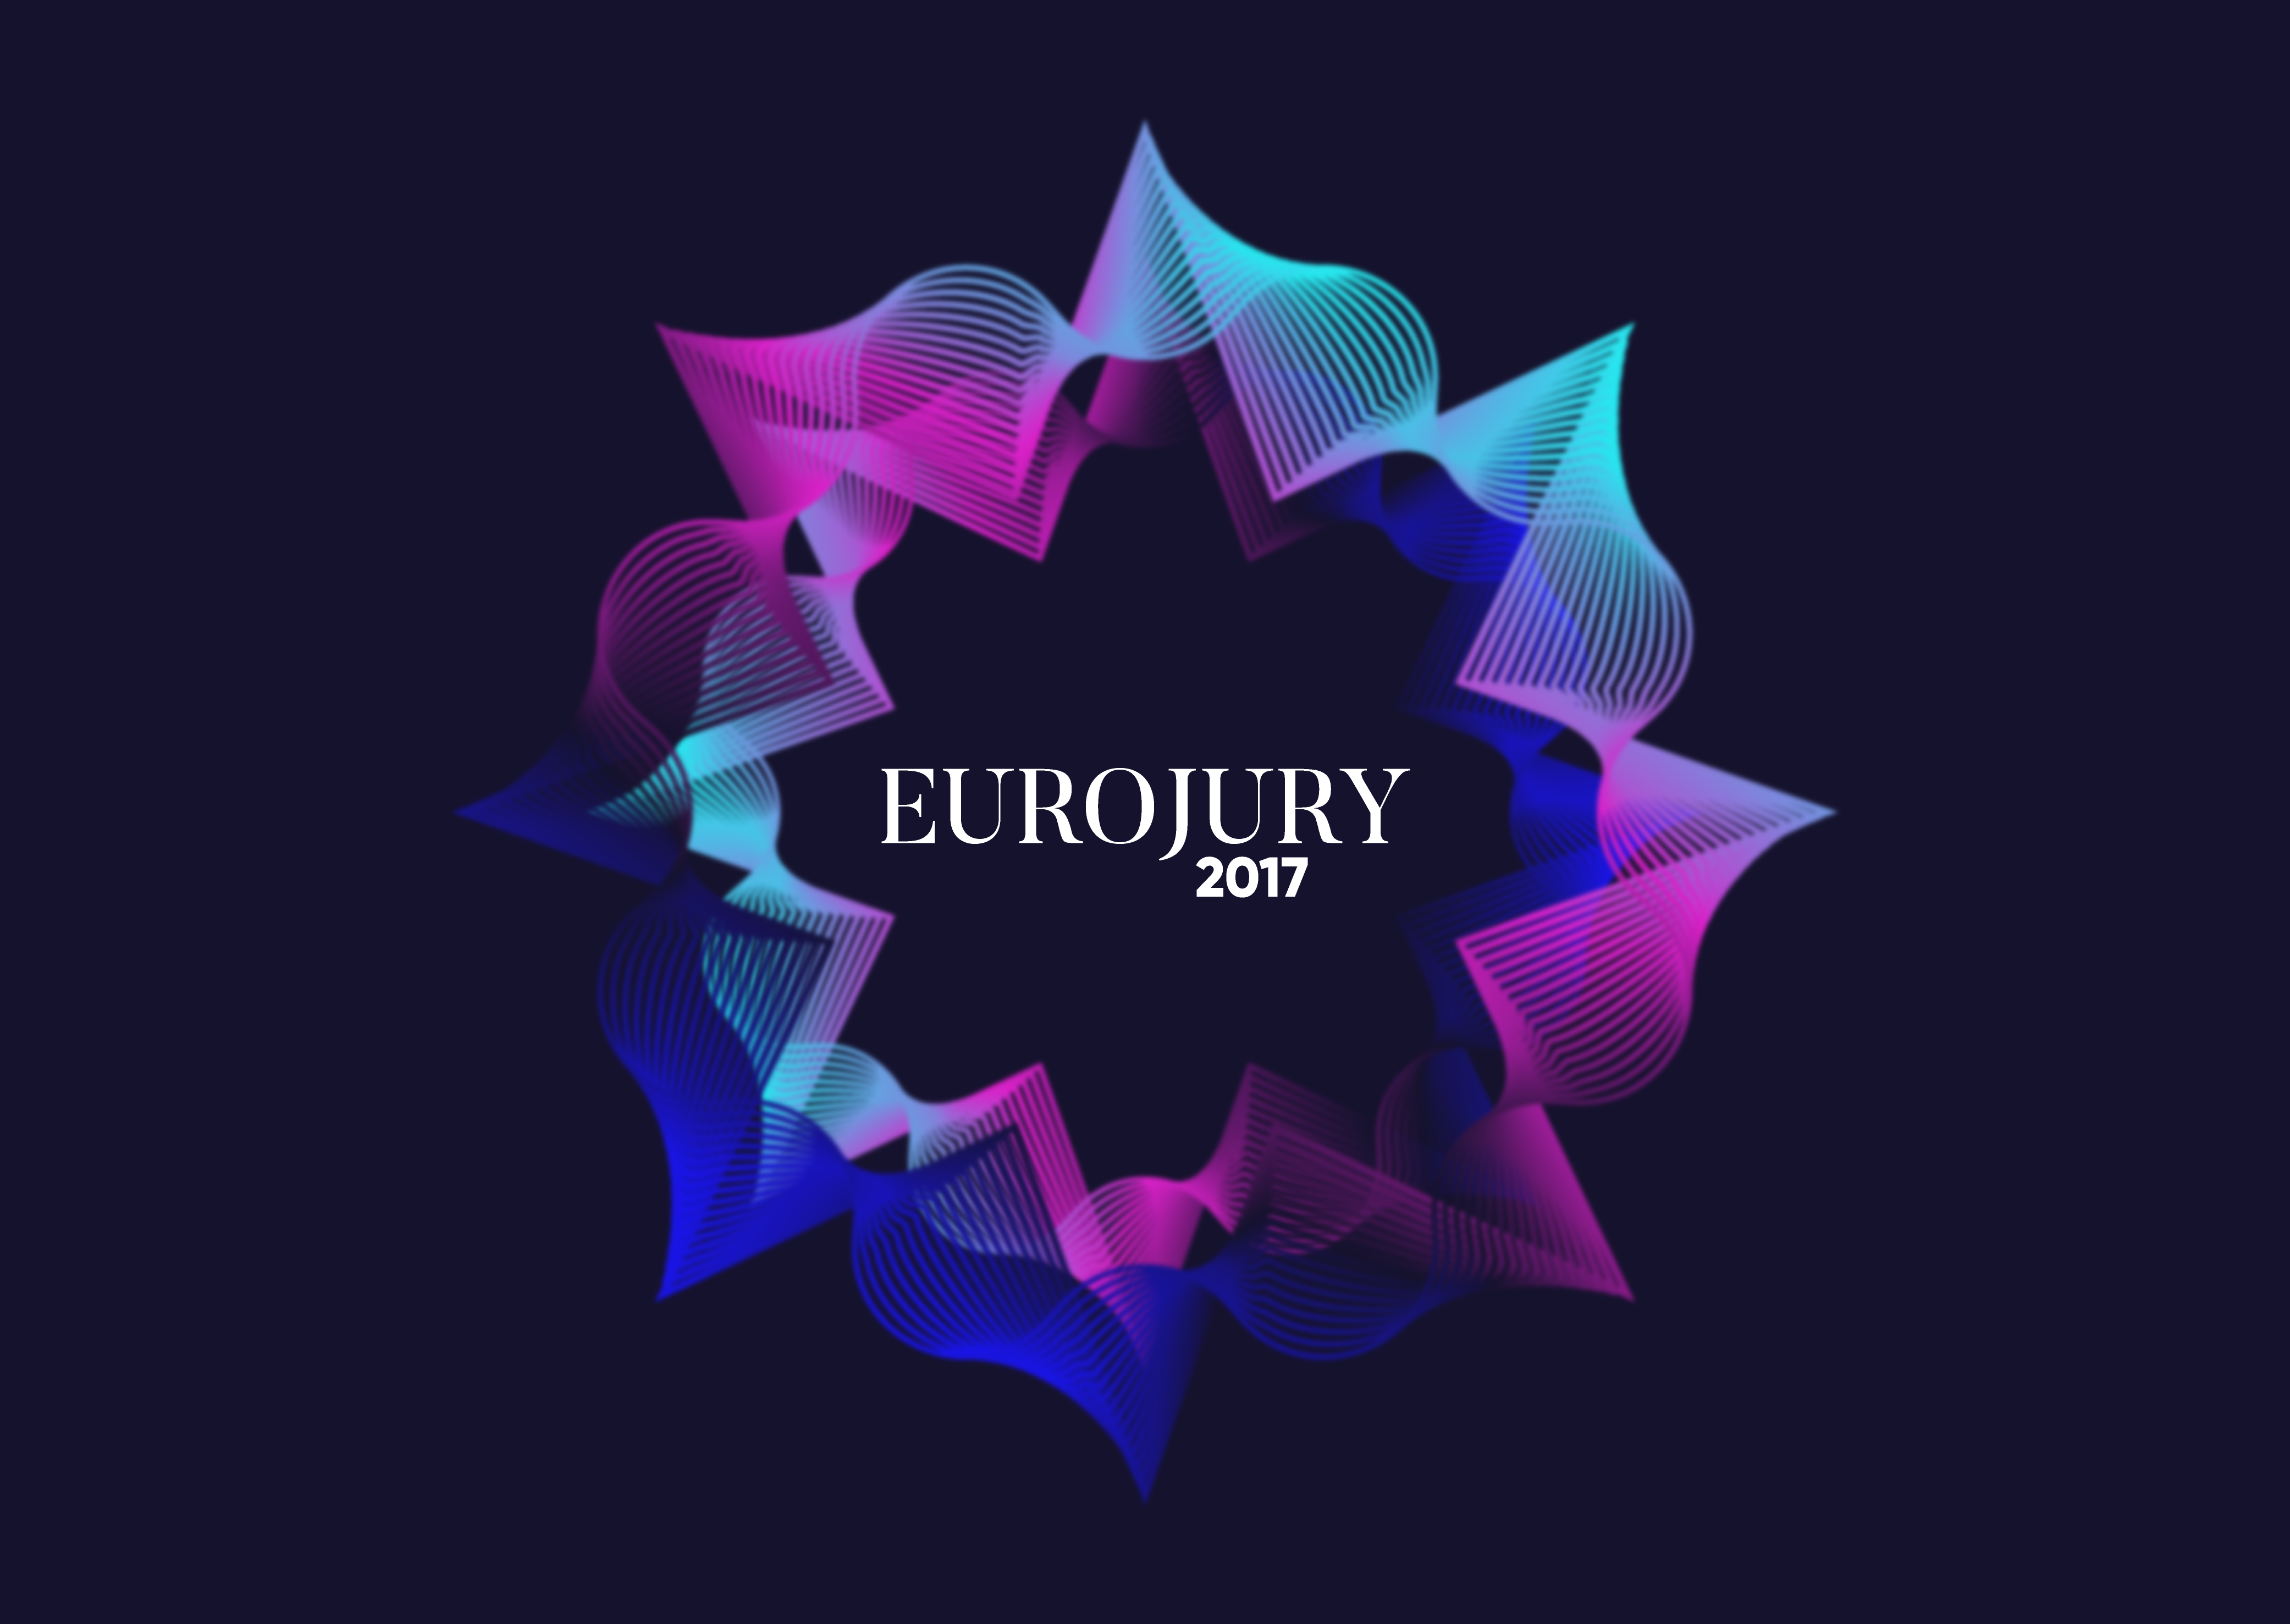 Eurojury 2017